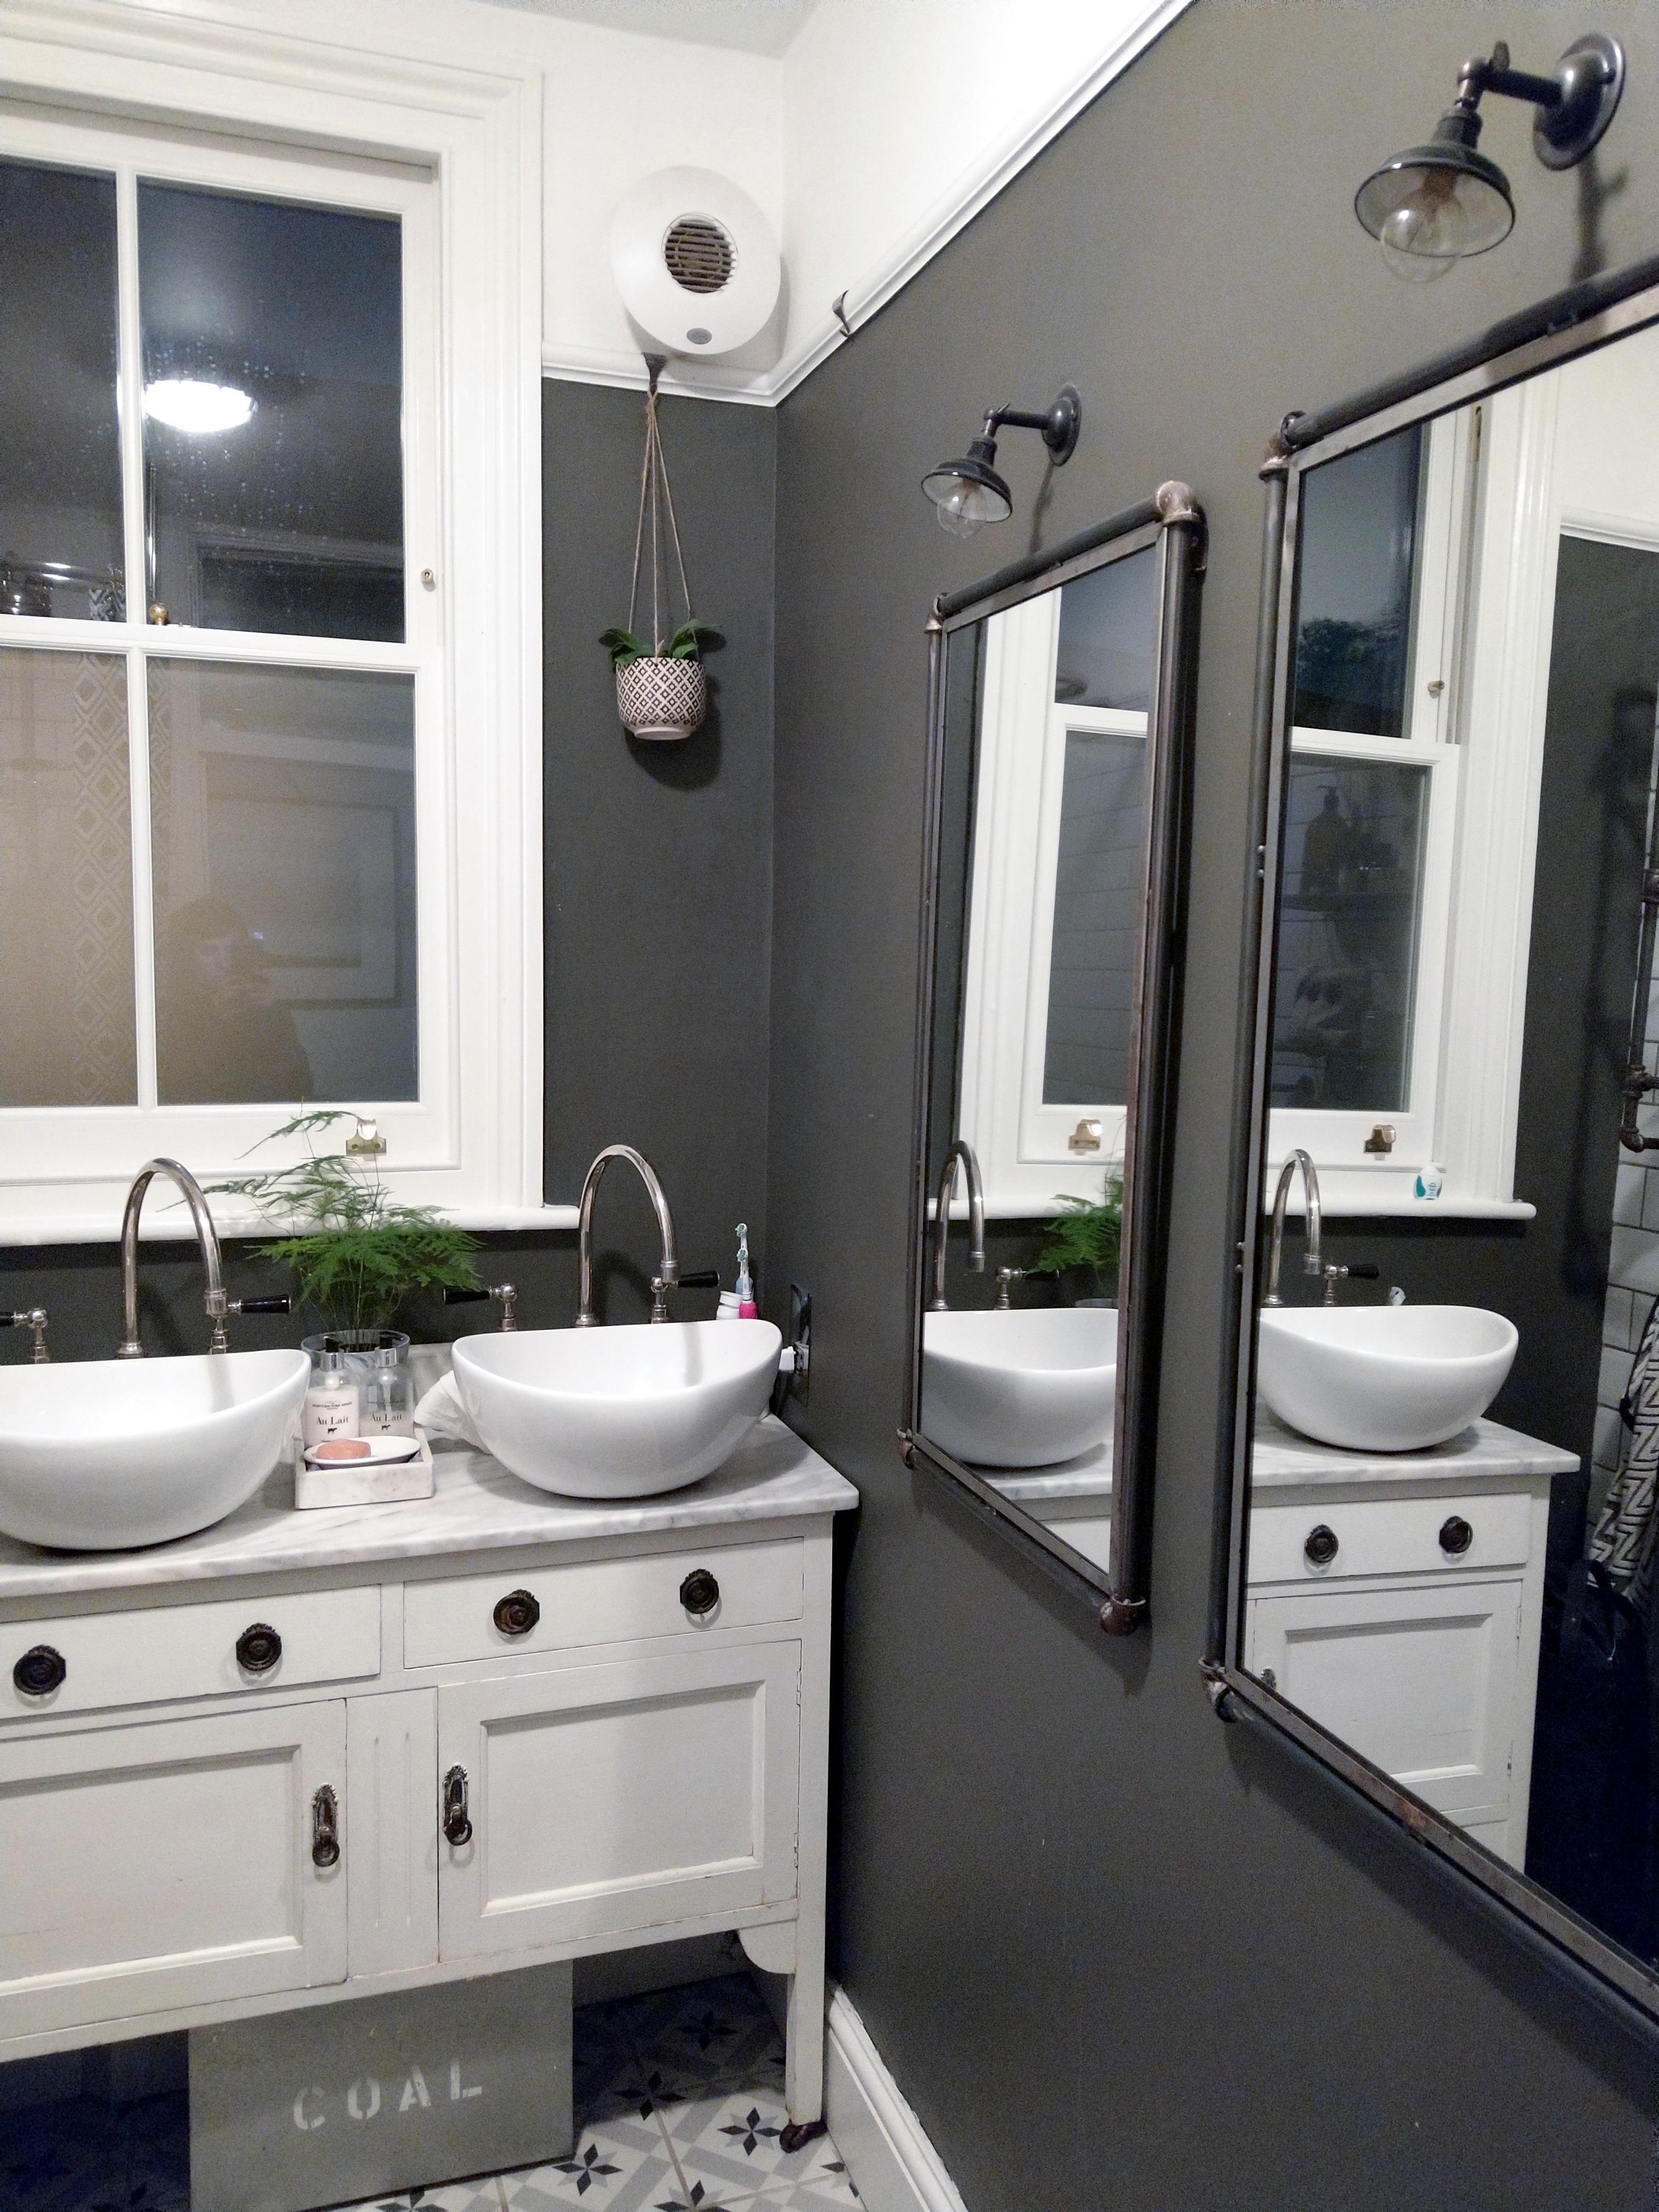 Monochrome Bathroom With Dulux Bowler Hat Paint Monochrome Bathroom Bathroom Design Bathroom Model